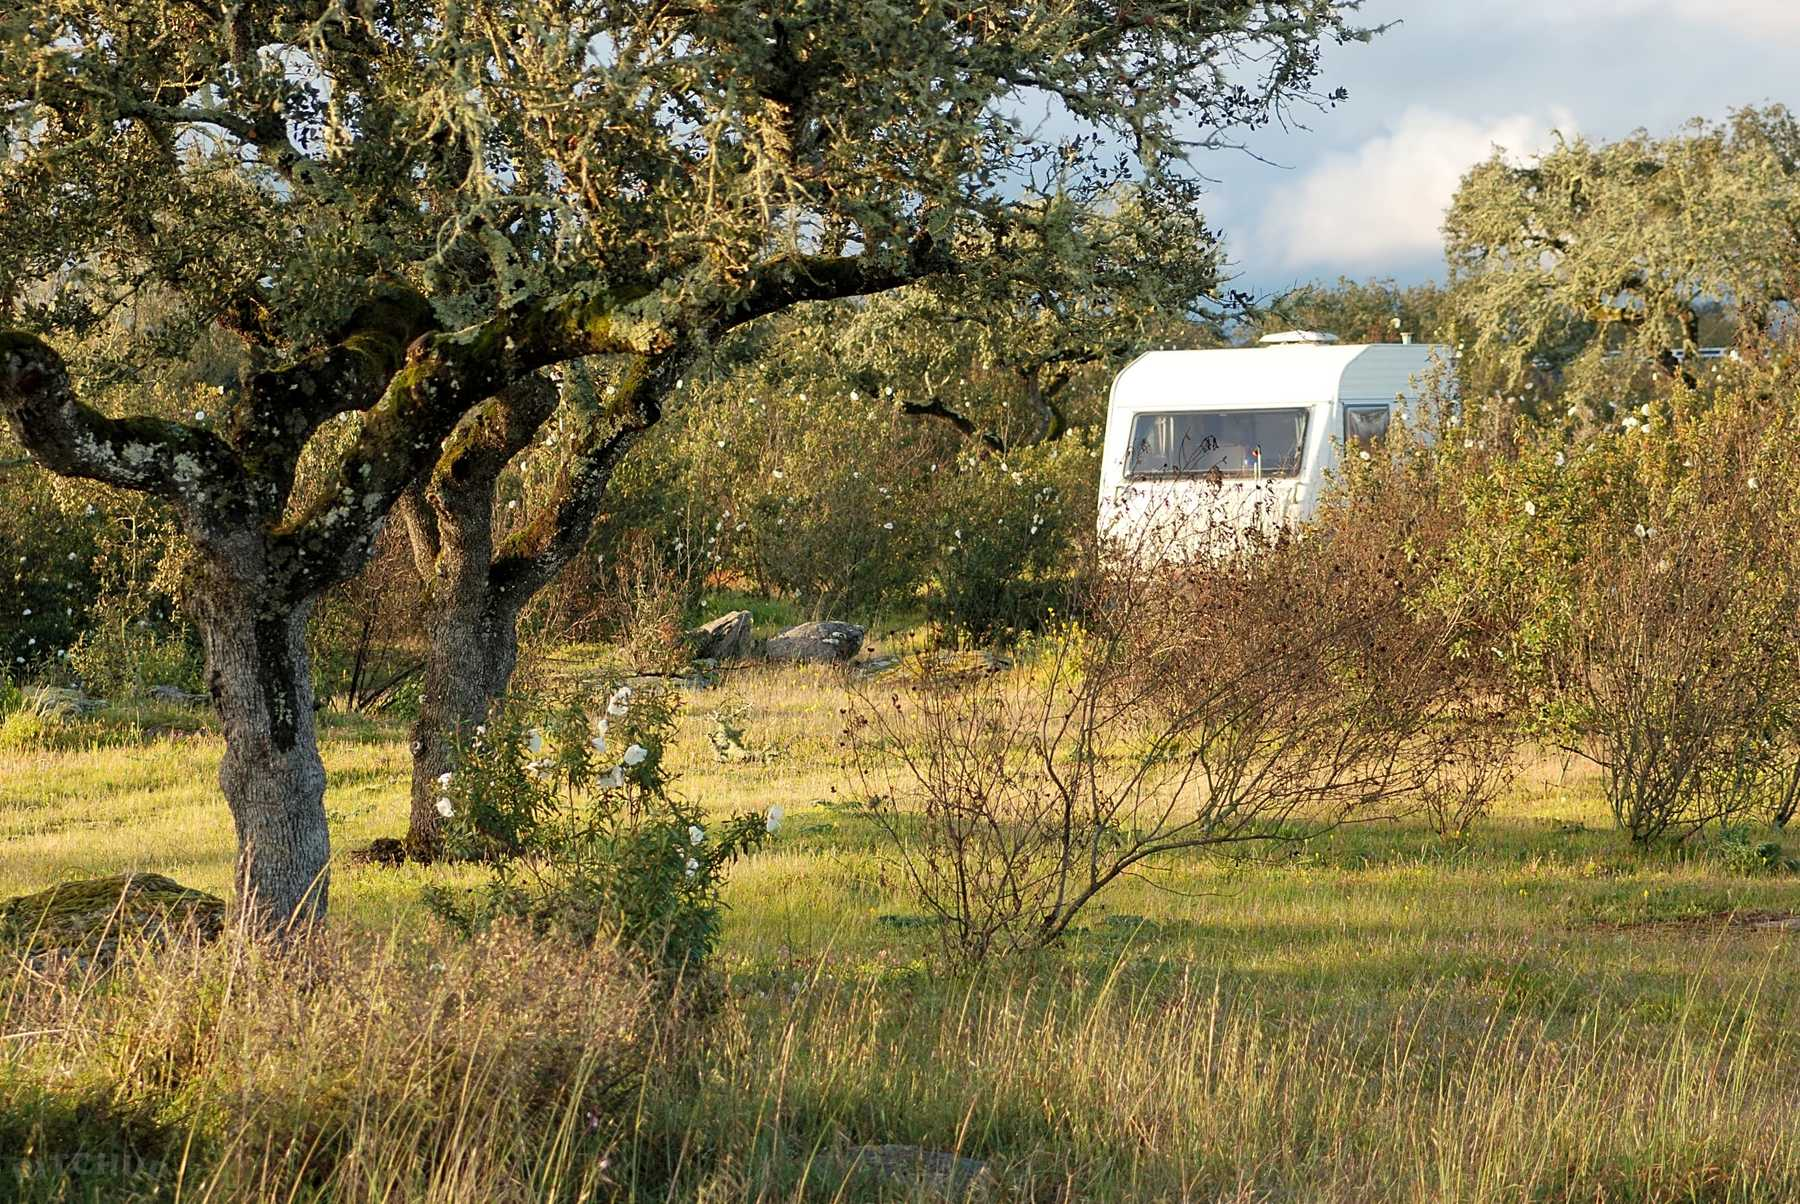 CAMPGROUND – Bubulcus & Bolotas Camping